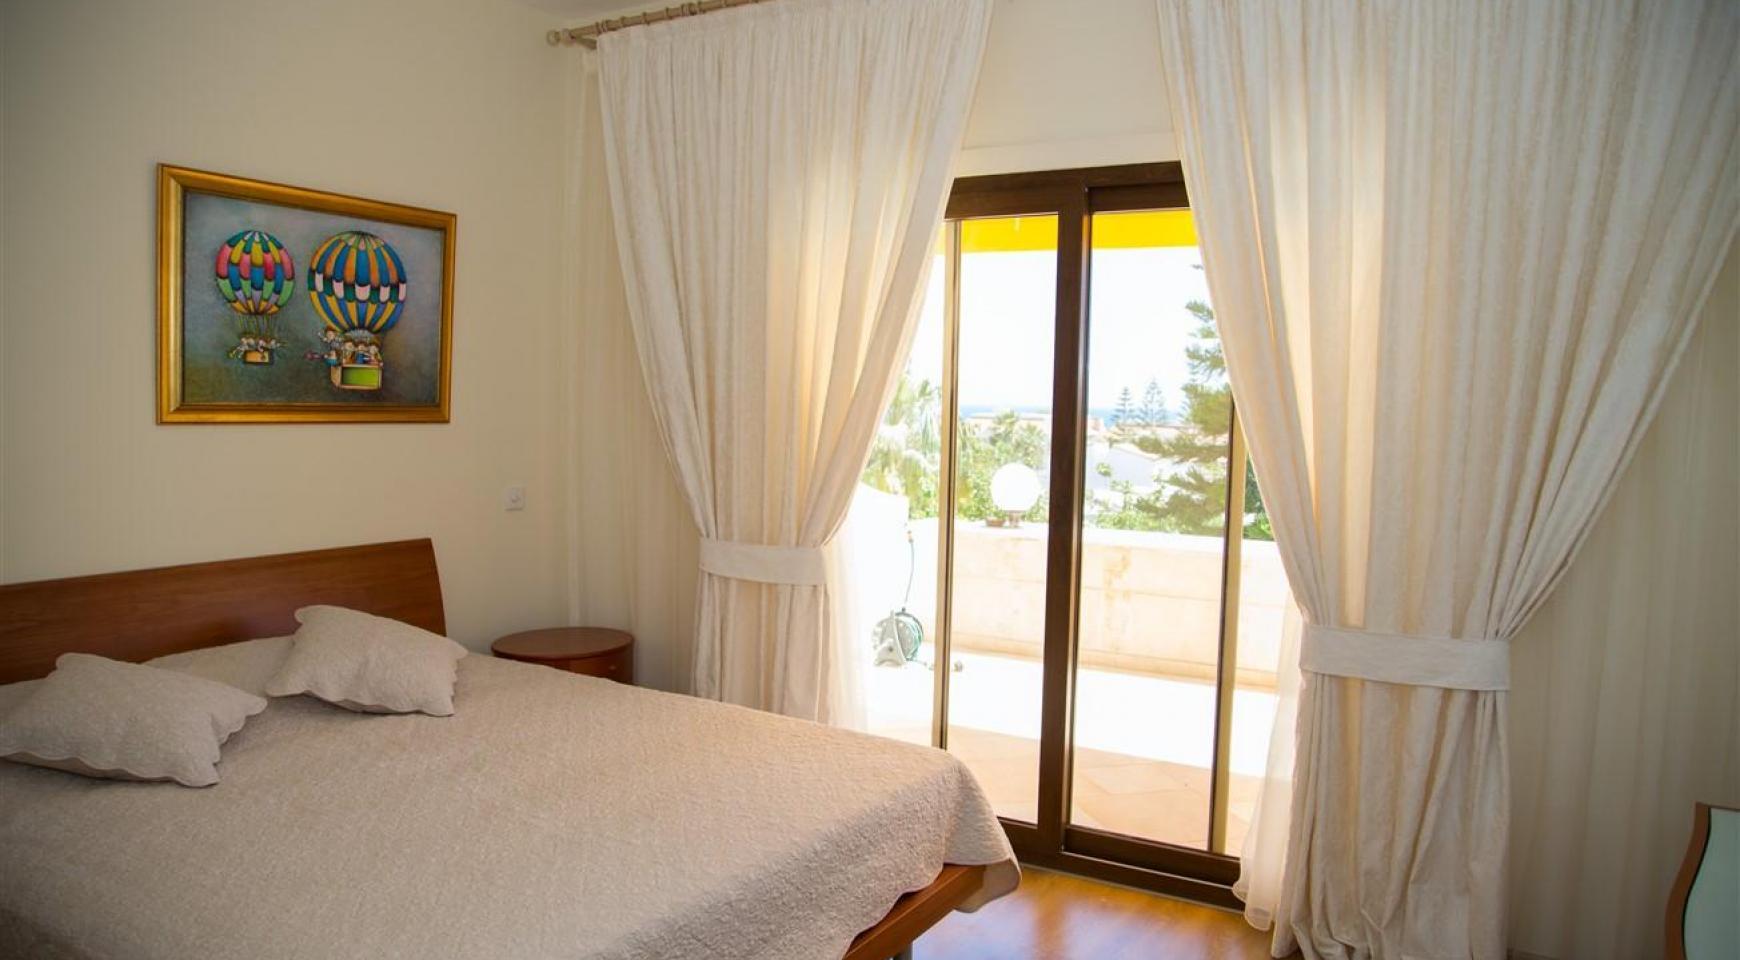 3-Спальная Квартира на Берегу Моря в Комплексе Thera   - 12